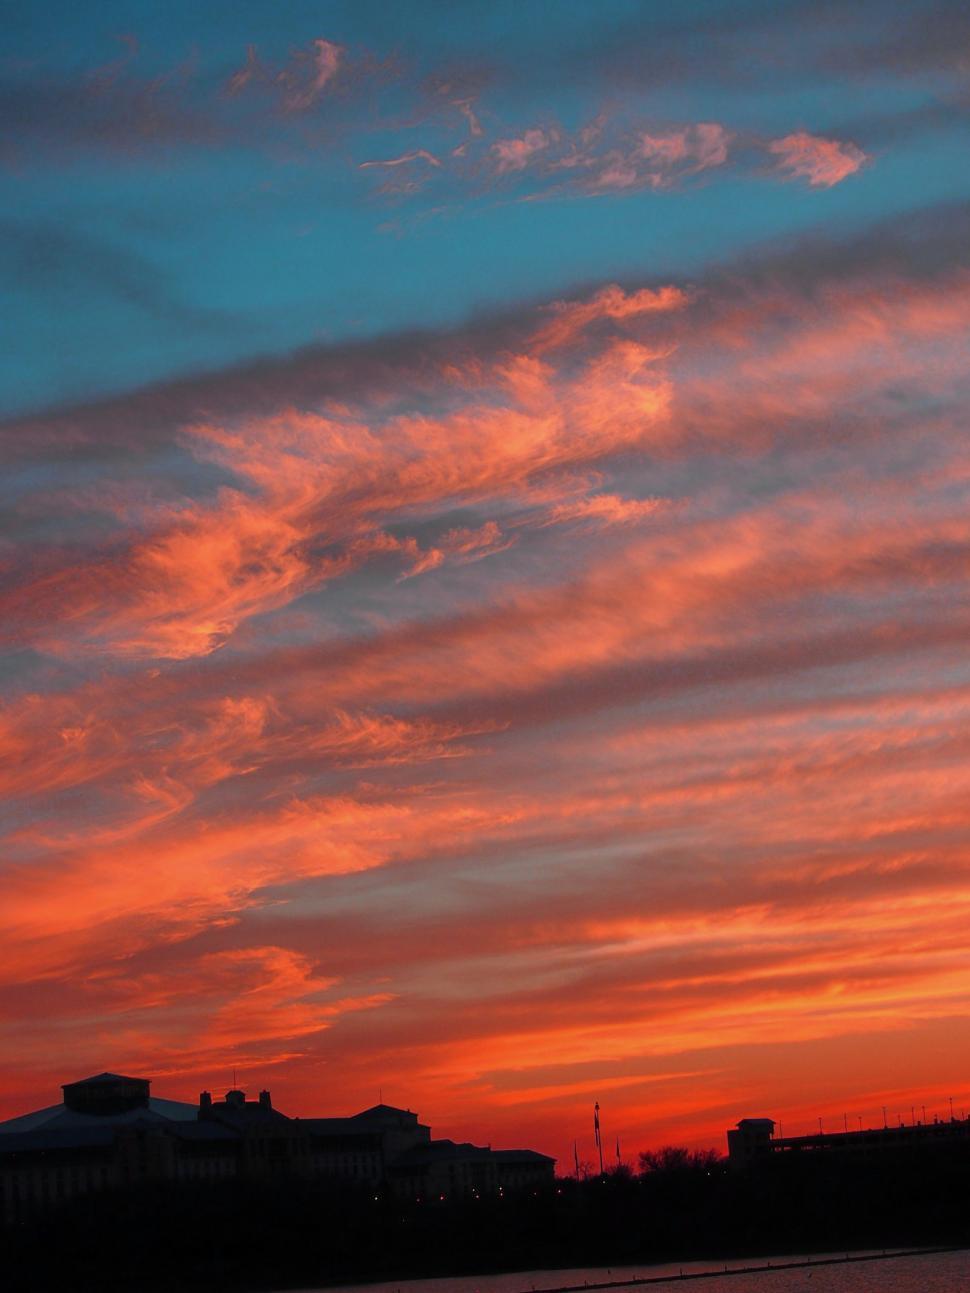 Download Free Stock Photo of Beautiful sunsets